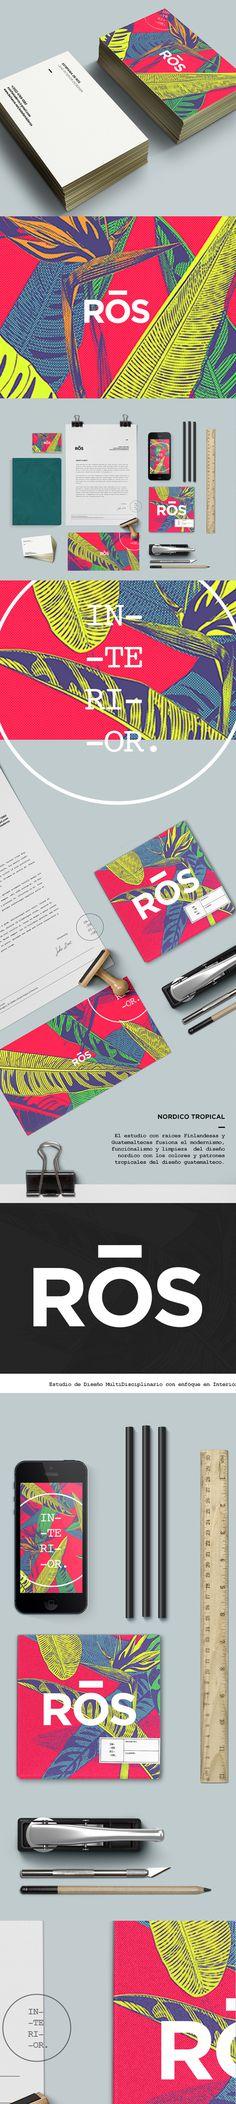 Ros Interior Design by Gustavo Quintana #branding